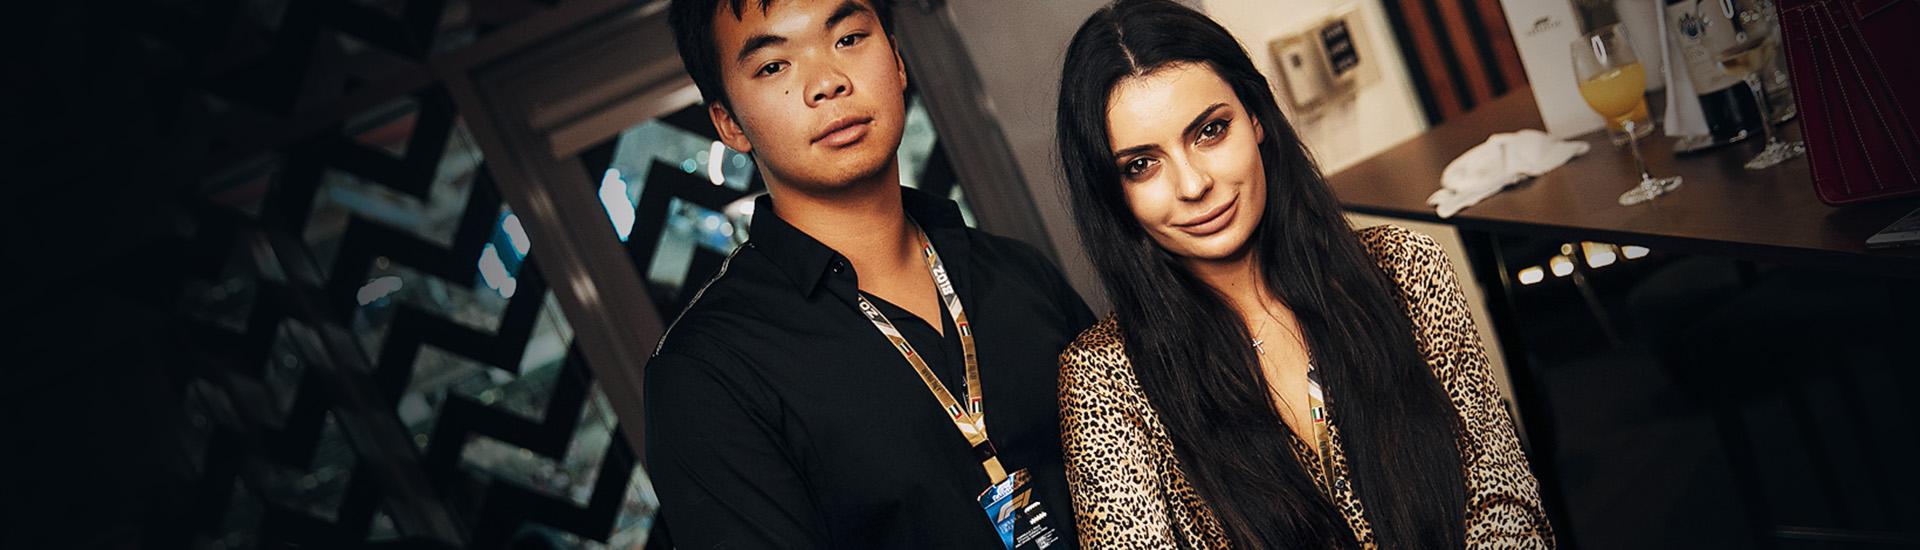 Incontri VIP Bangladesh